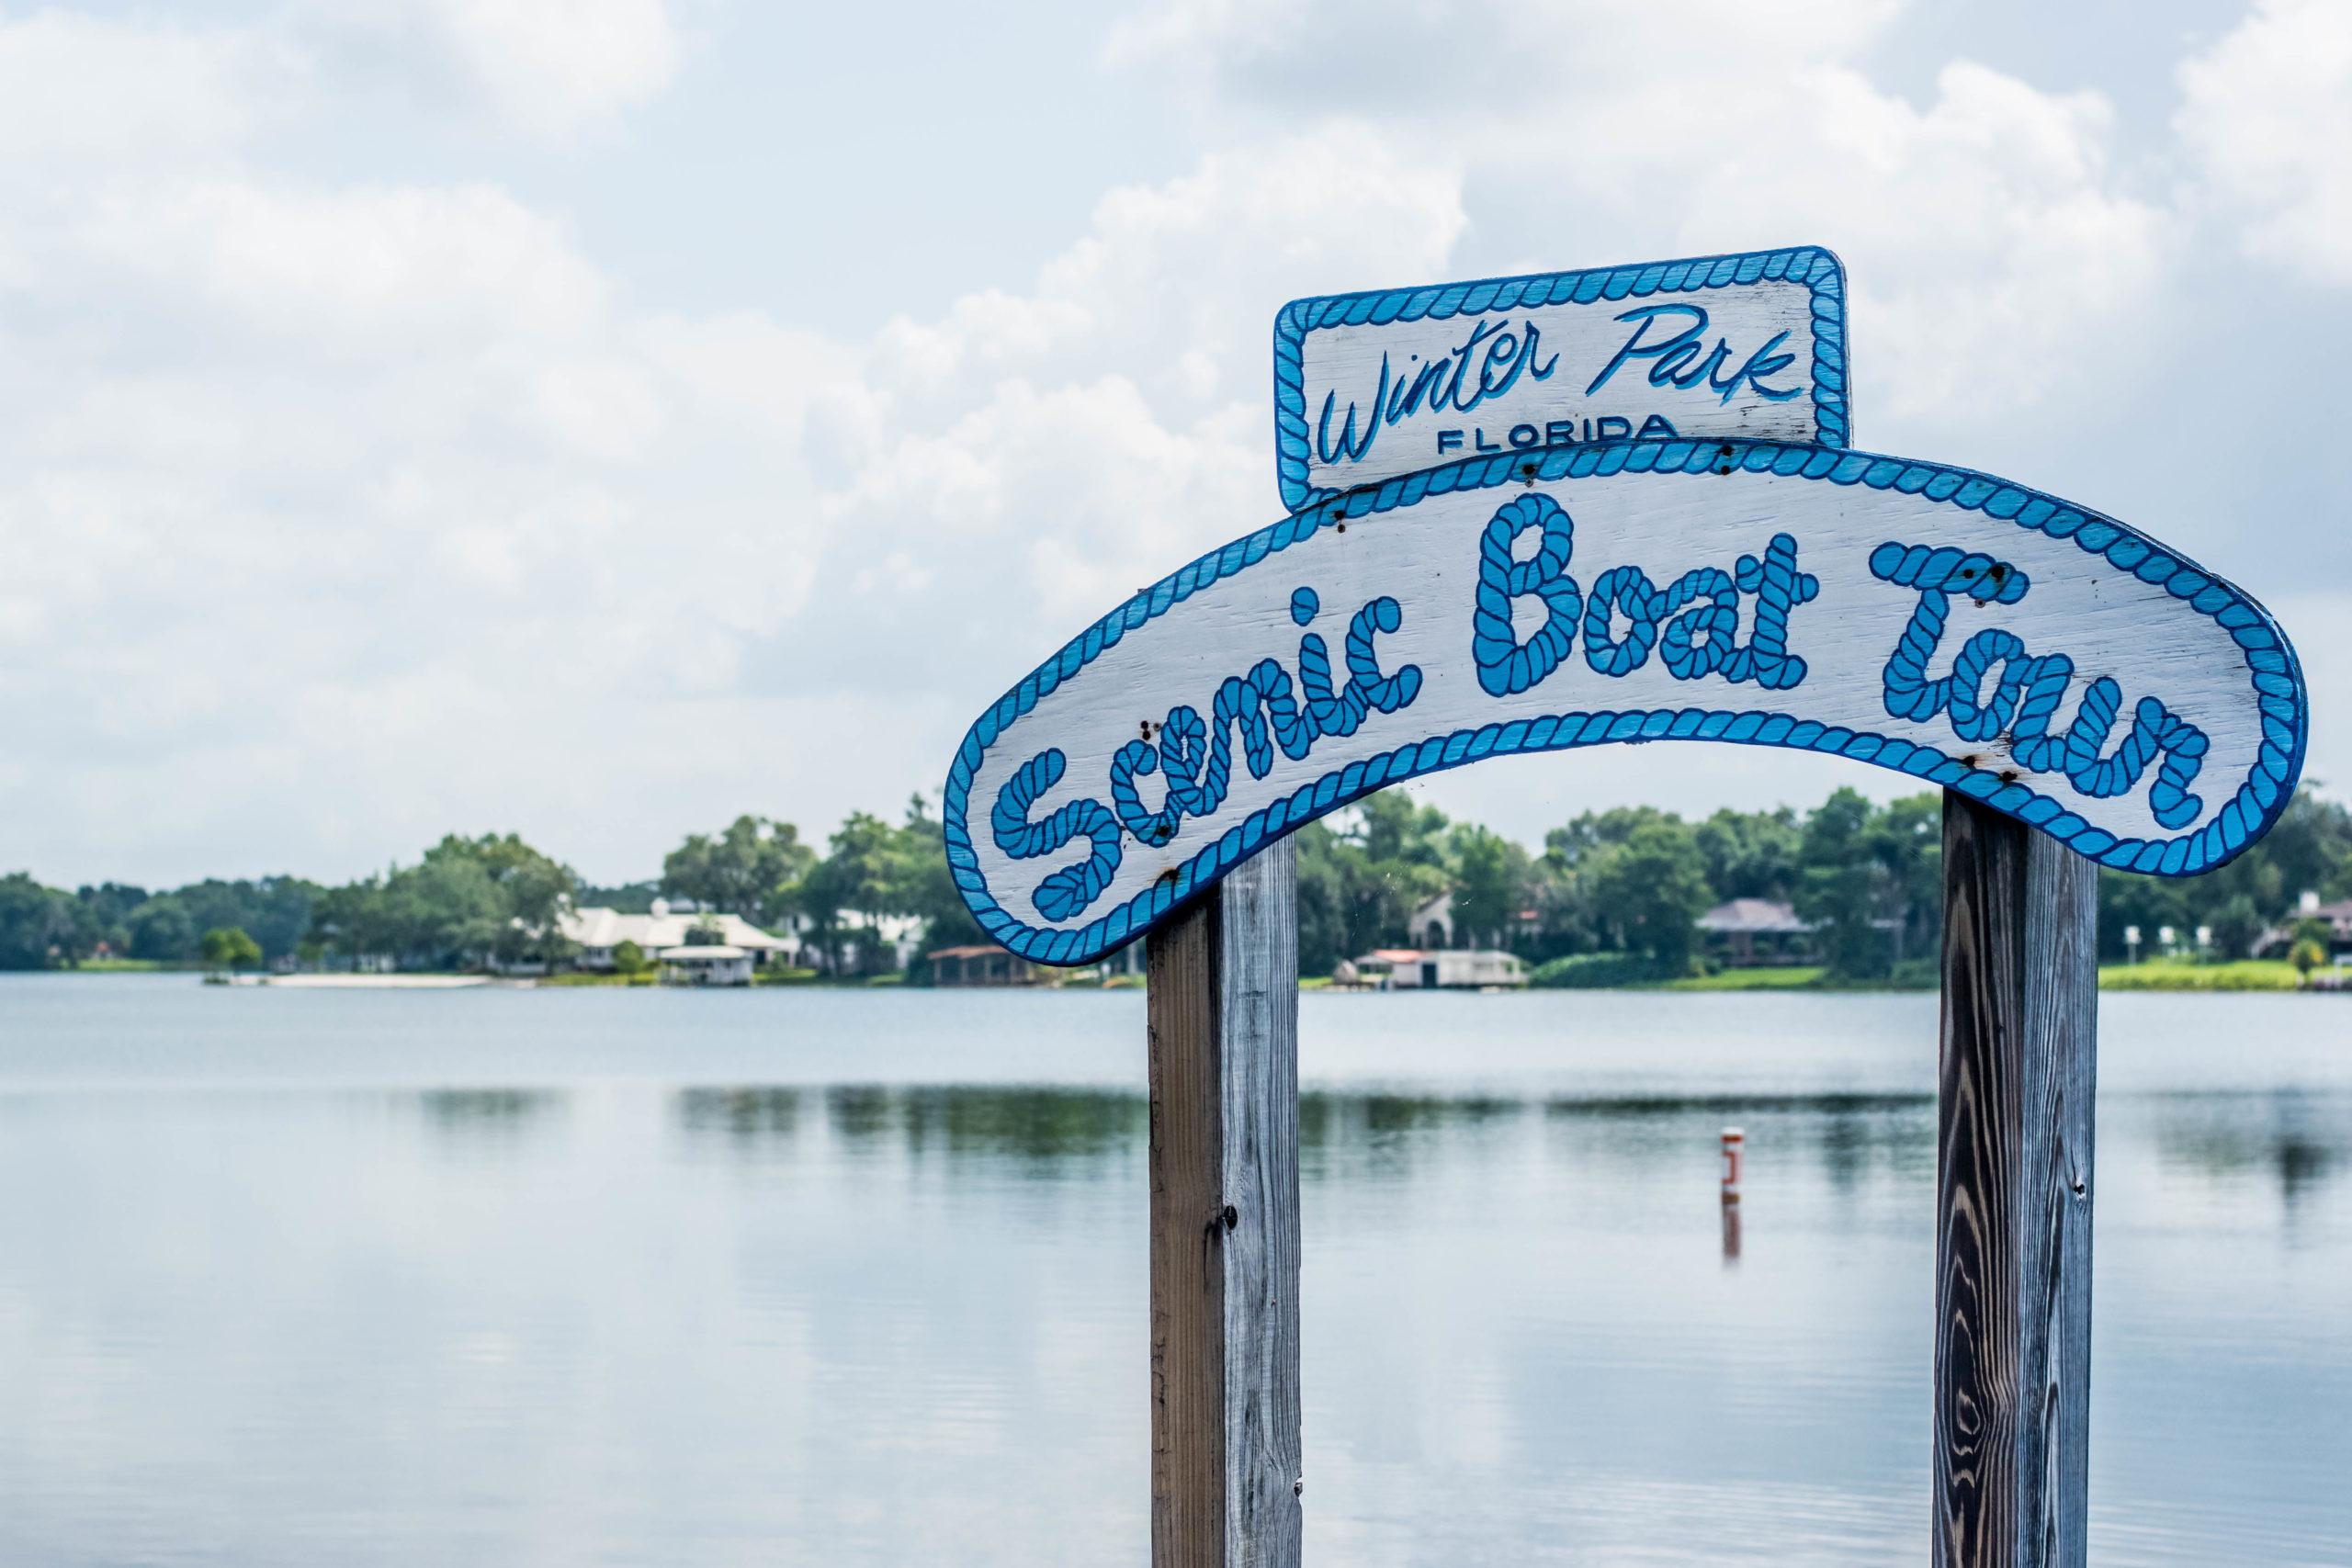 Winter Park Scenic Boat Tour sign.